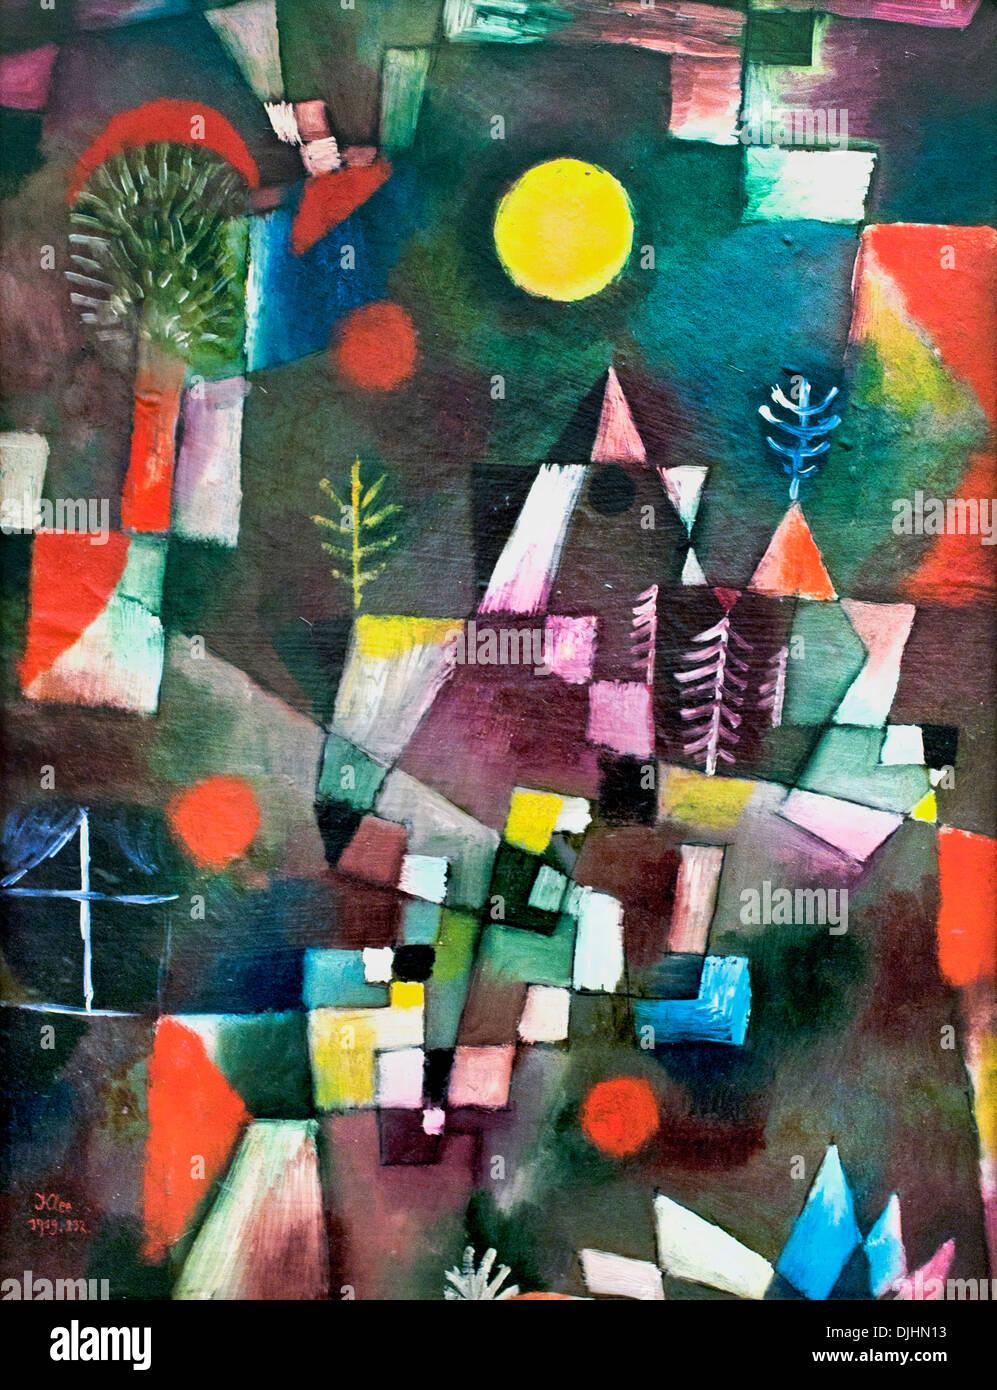 Der Vollmond  - The full moon 1919 Paul Klee 1879 - 1940 German born in Switzerland  Swiss - Stock Image